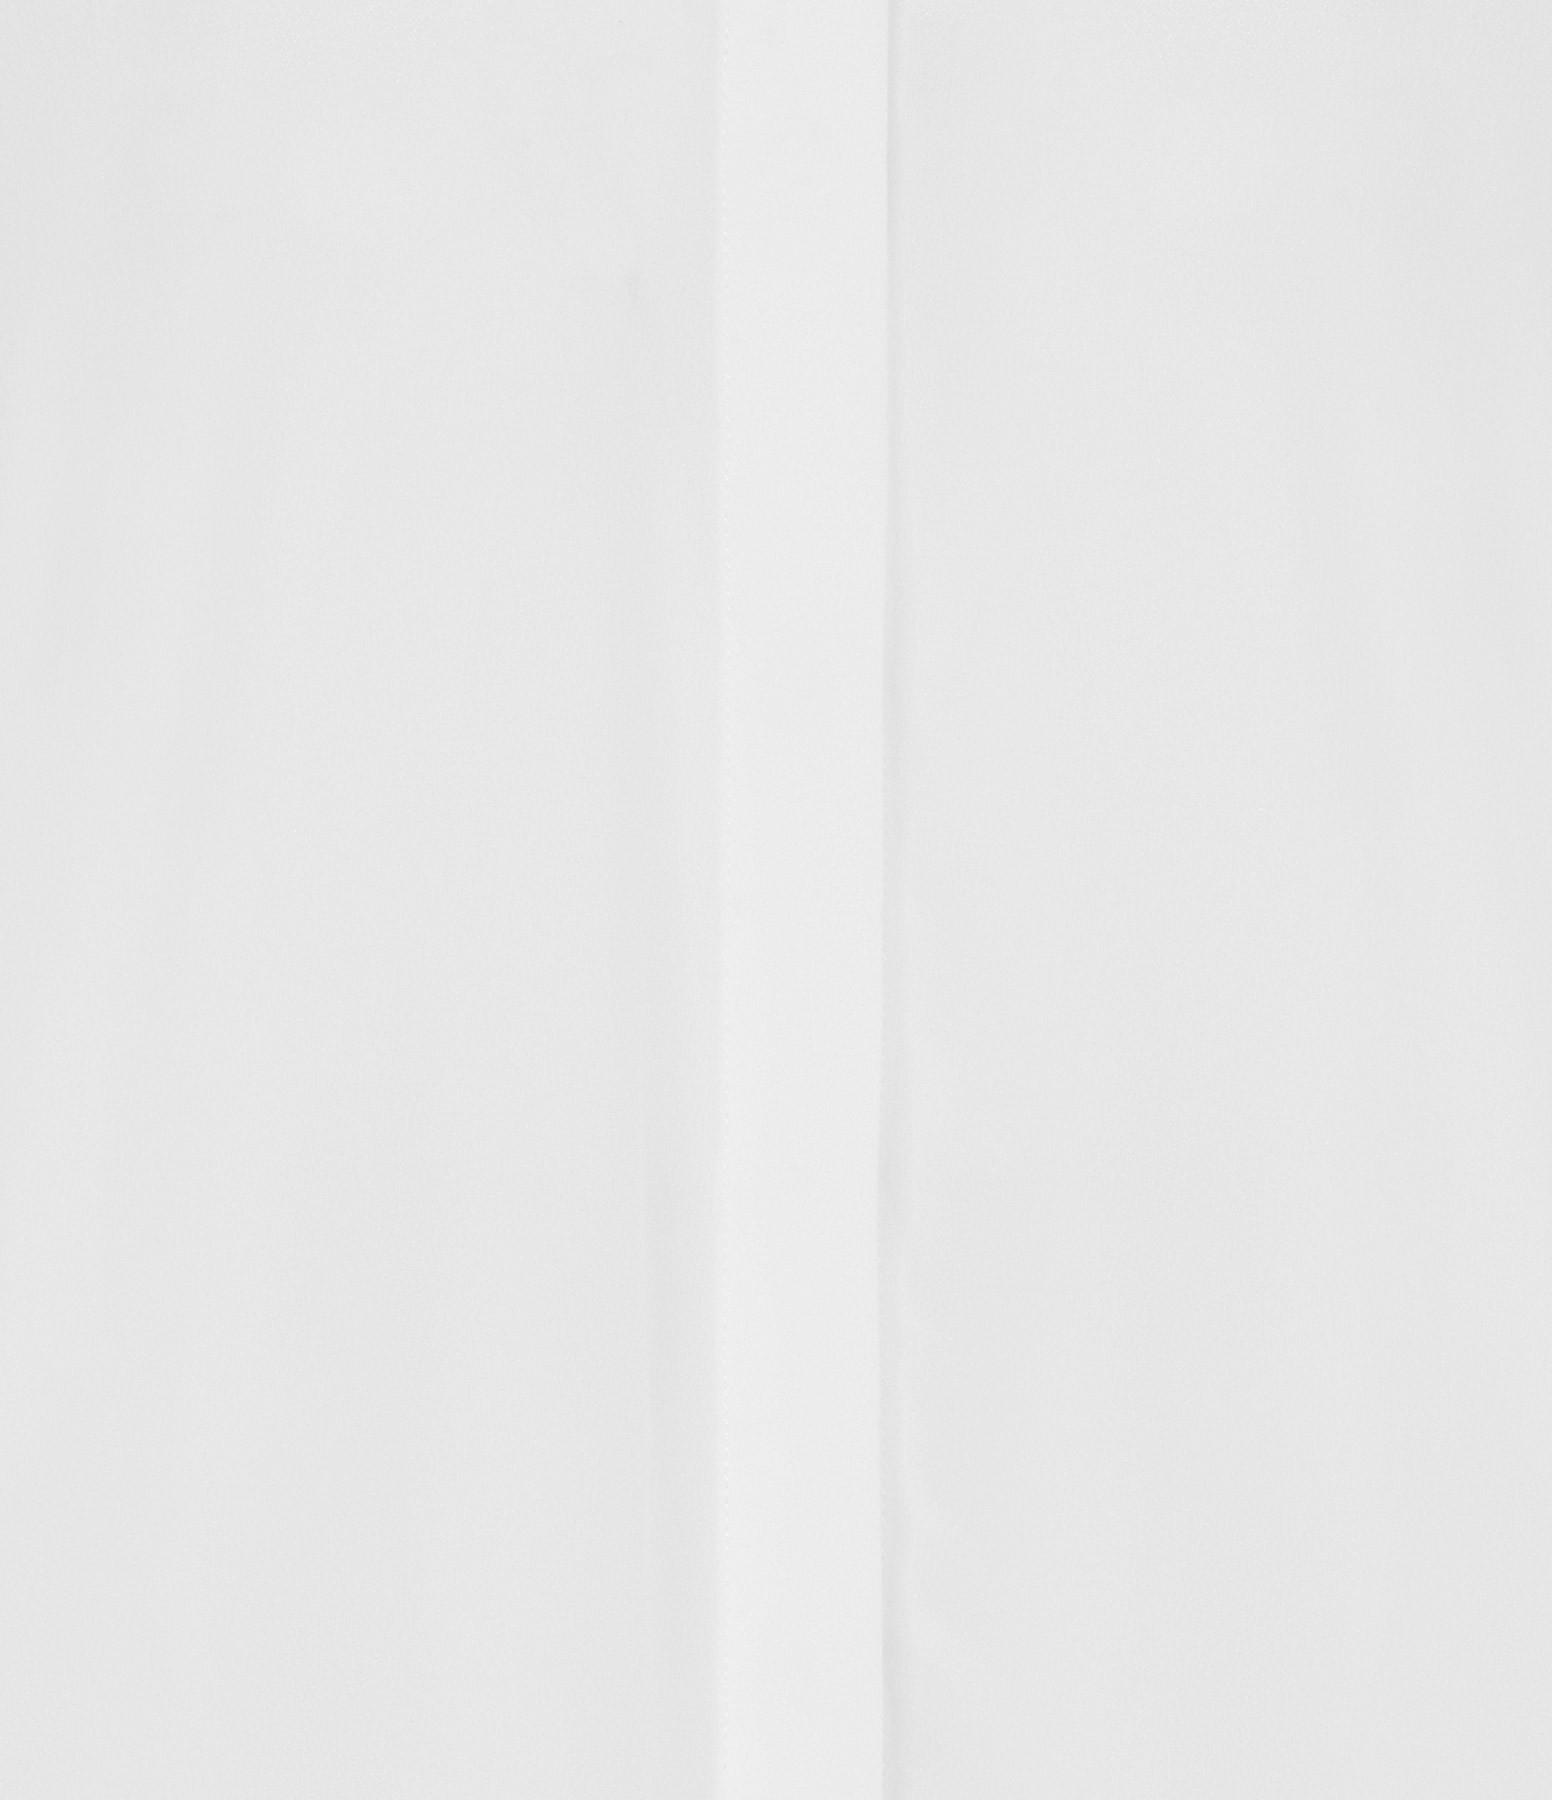 MARGAUX LONNBERG - Chemise Brune Blanc